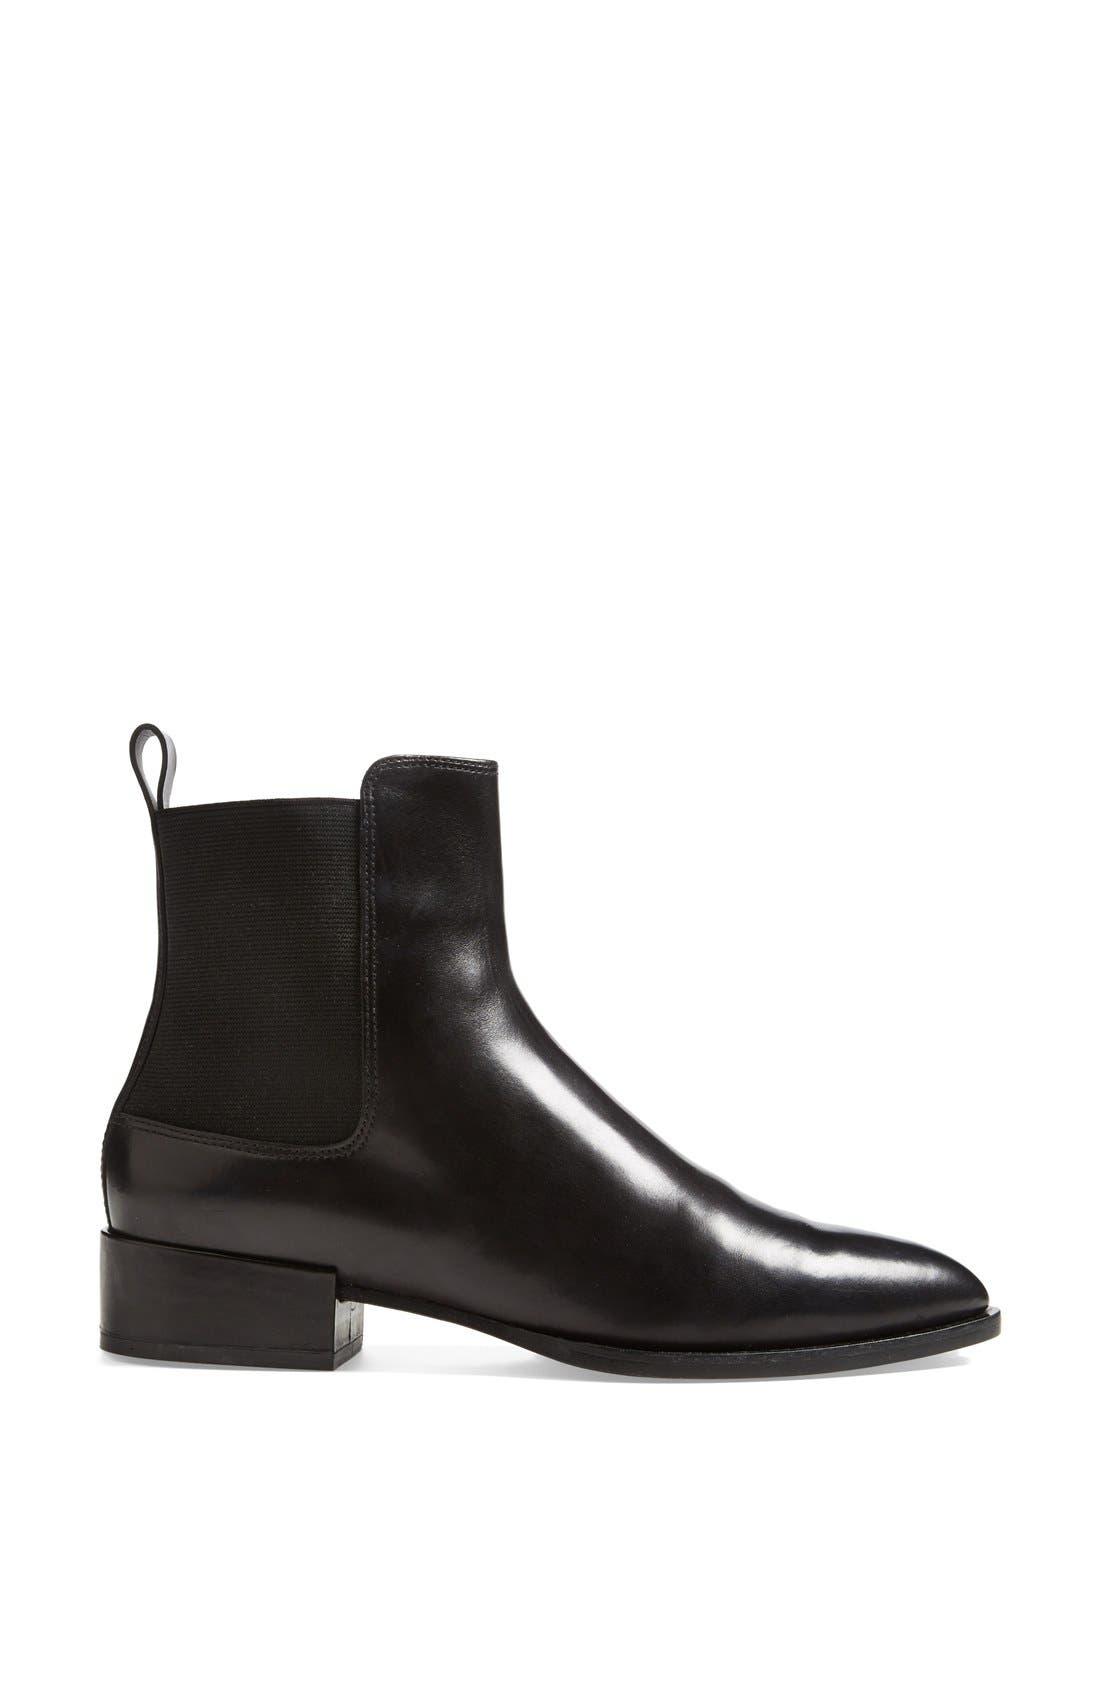 'Yarmon' Almond Toe Calfskin Leather Chelsea Boot,                             Alternate thumbnail 4, color,                             002